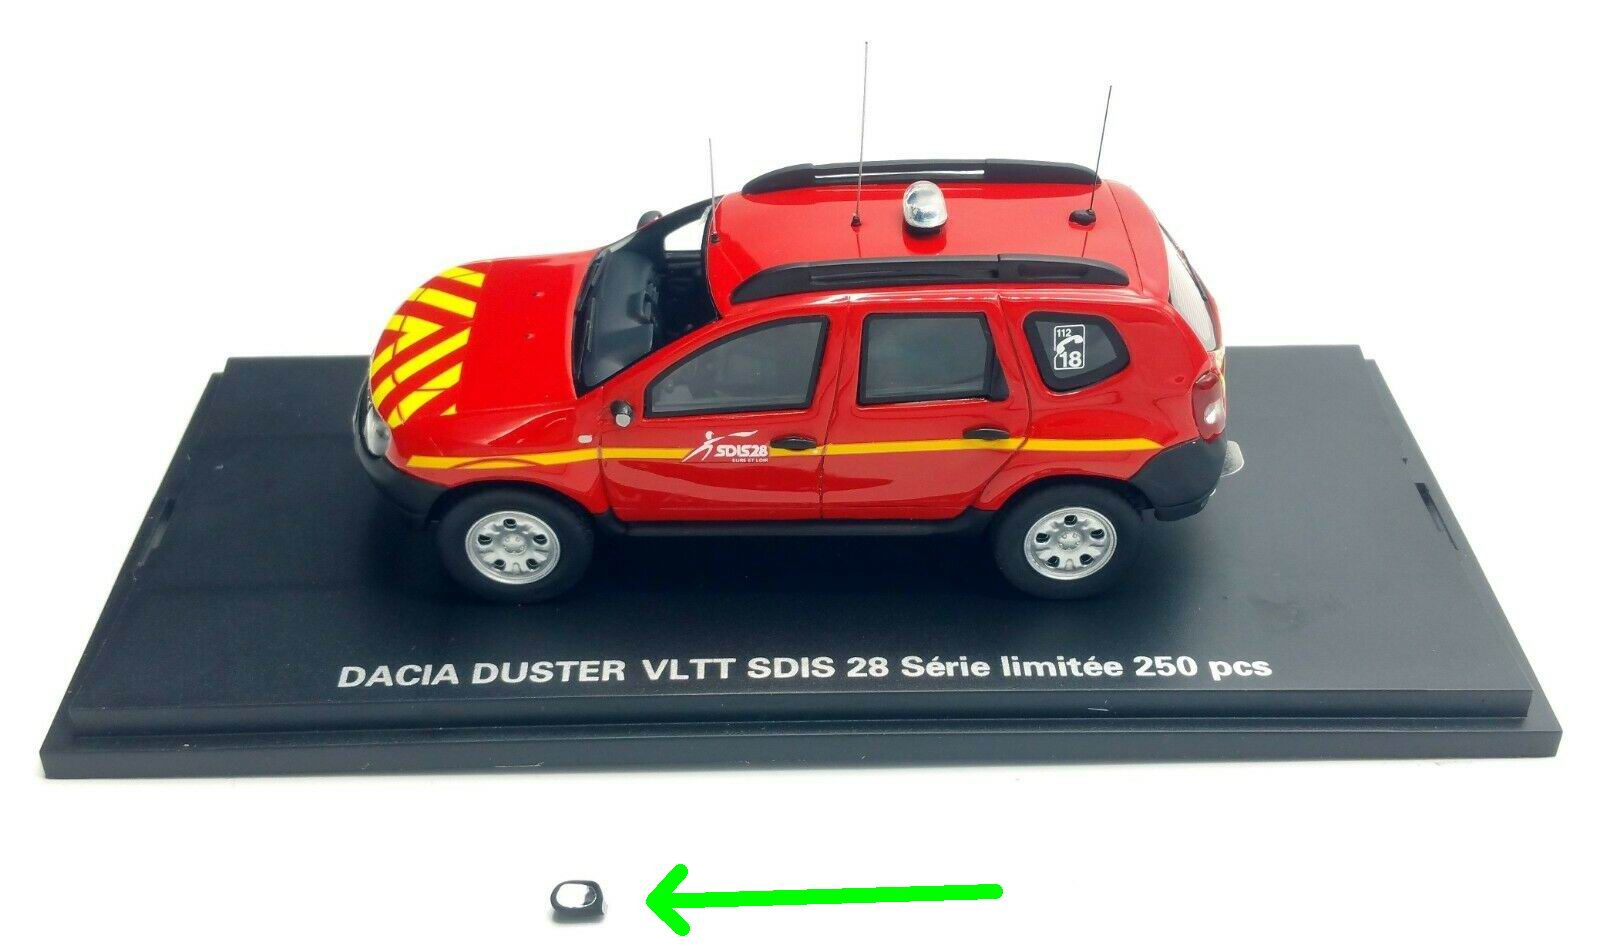 Dacia Duster Vltt Pompiers Véhicule Alarme Miniaturesgt; lcF1JTK